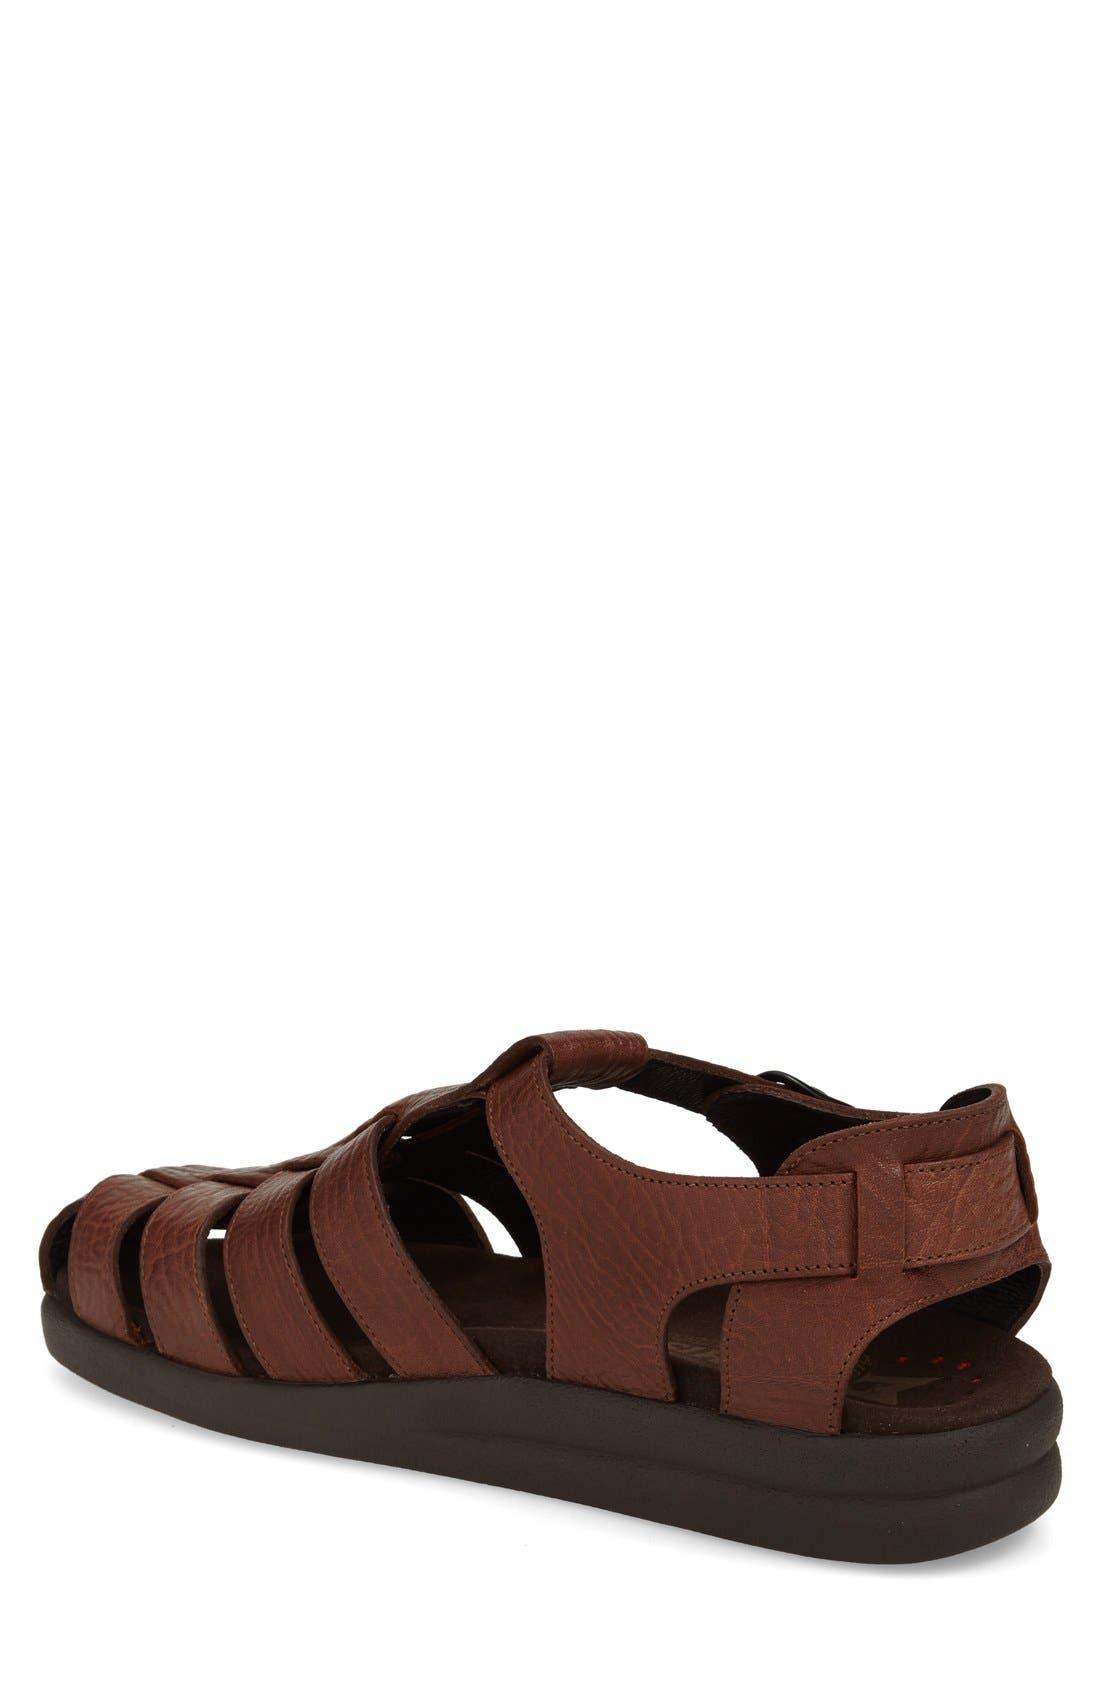 Alternate Image 2  - Mephisto 'Sam' Sandal